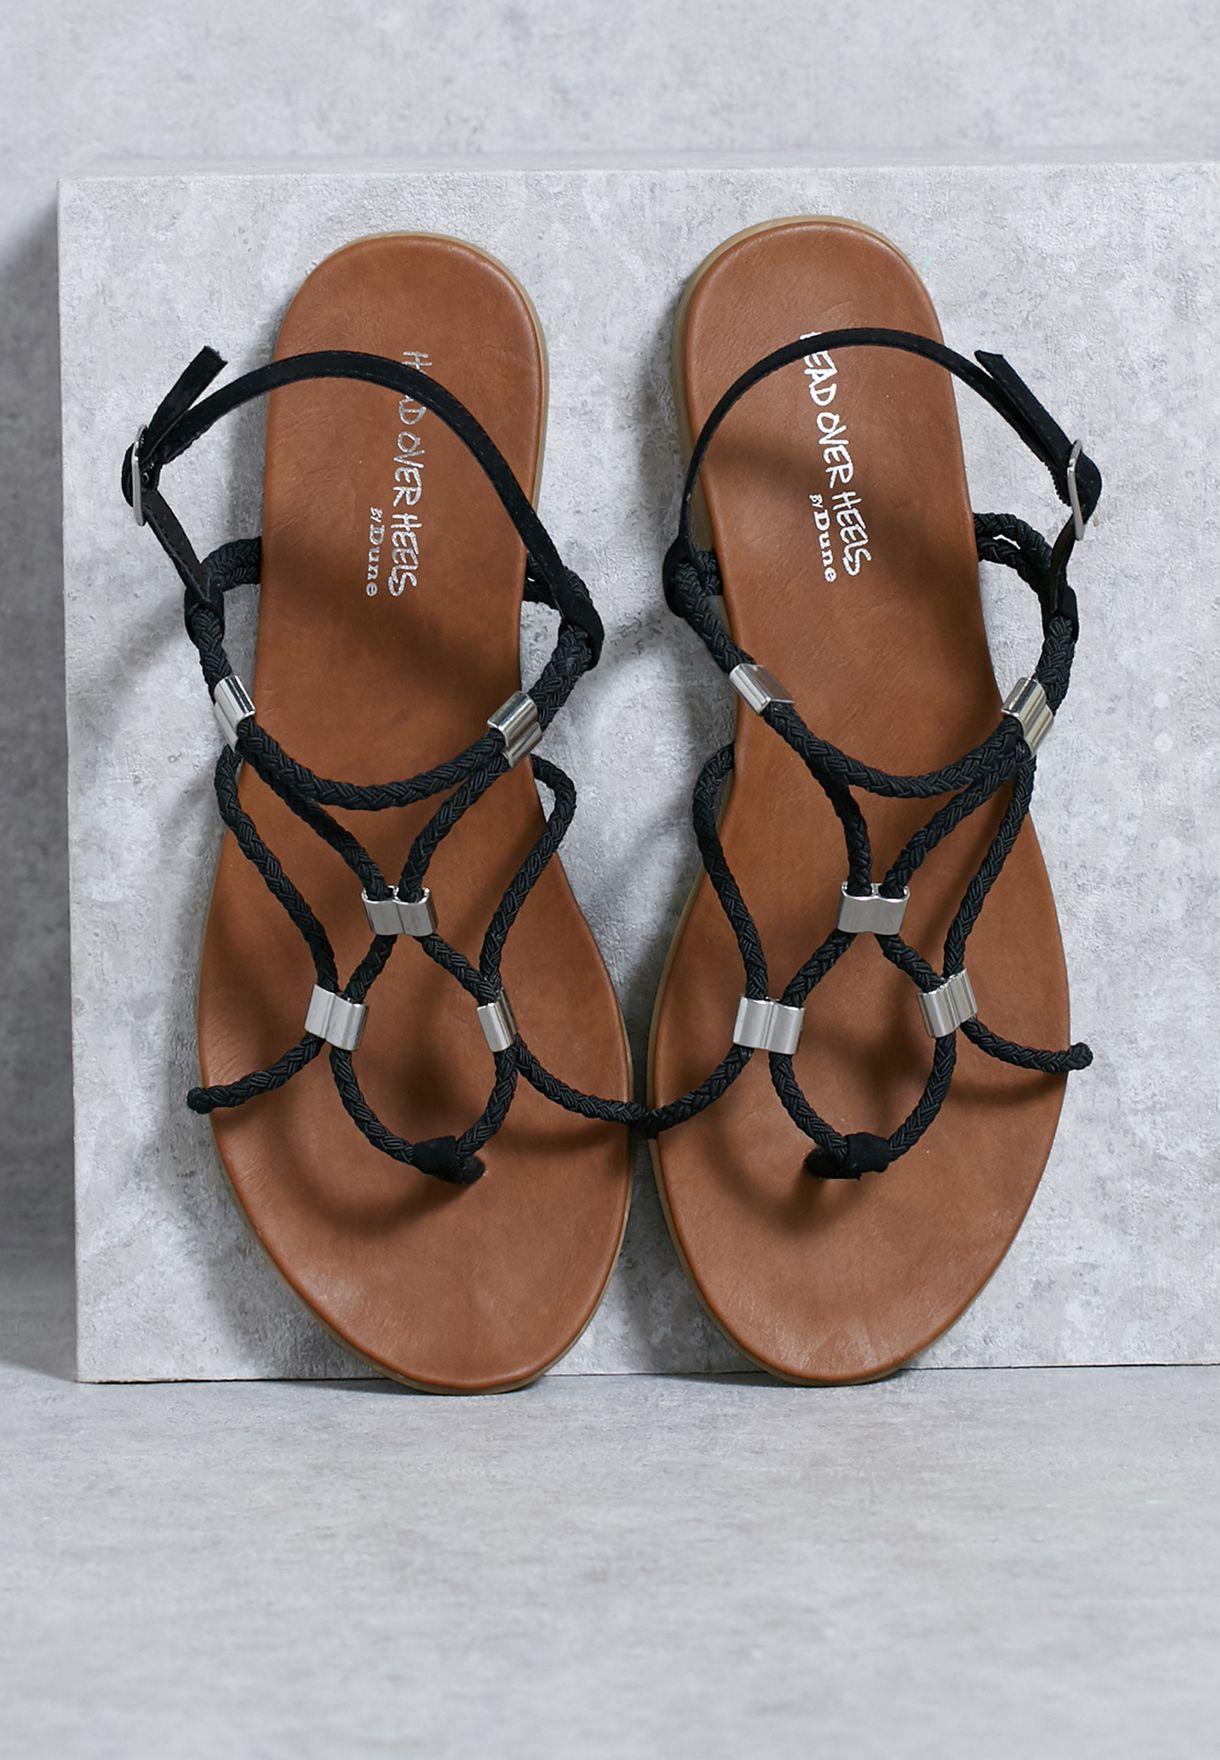 7fd47eb4af2 Shop Dune Head Over Heels black Twist Braided Flat Sandals ...